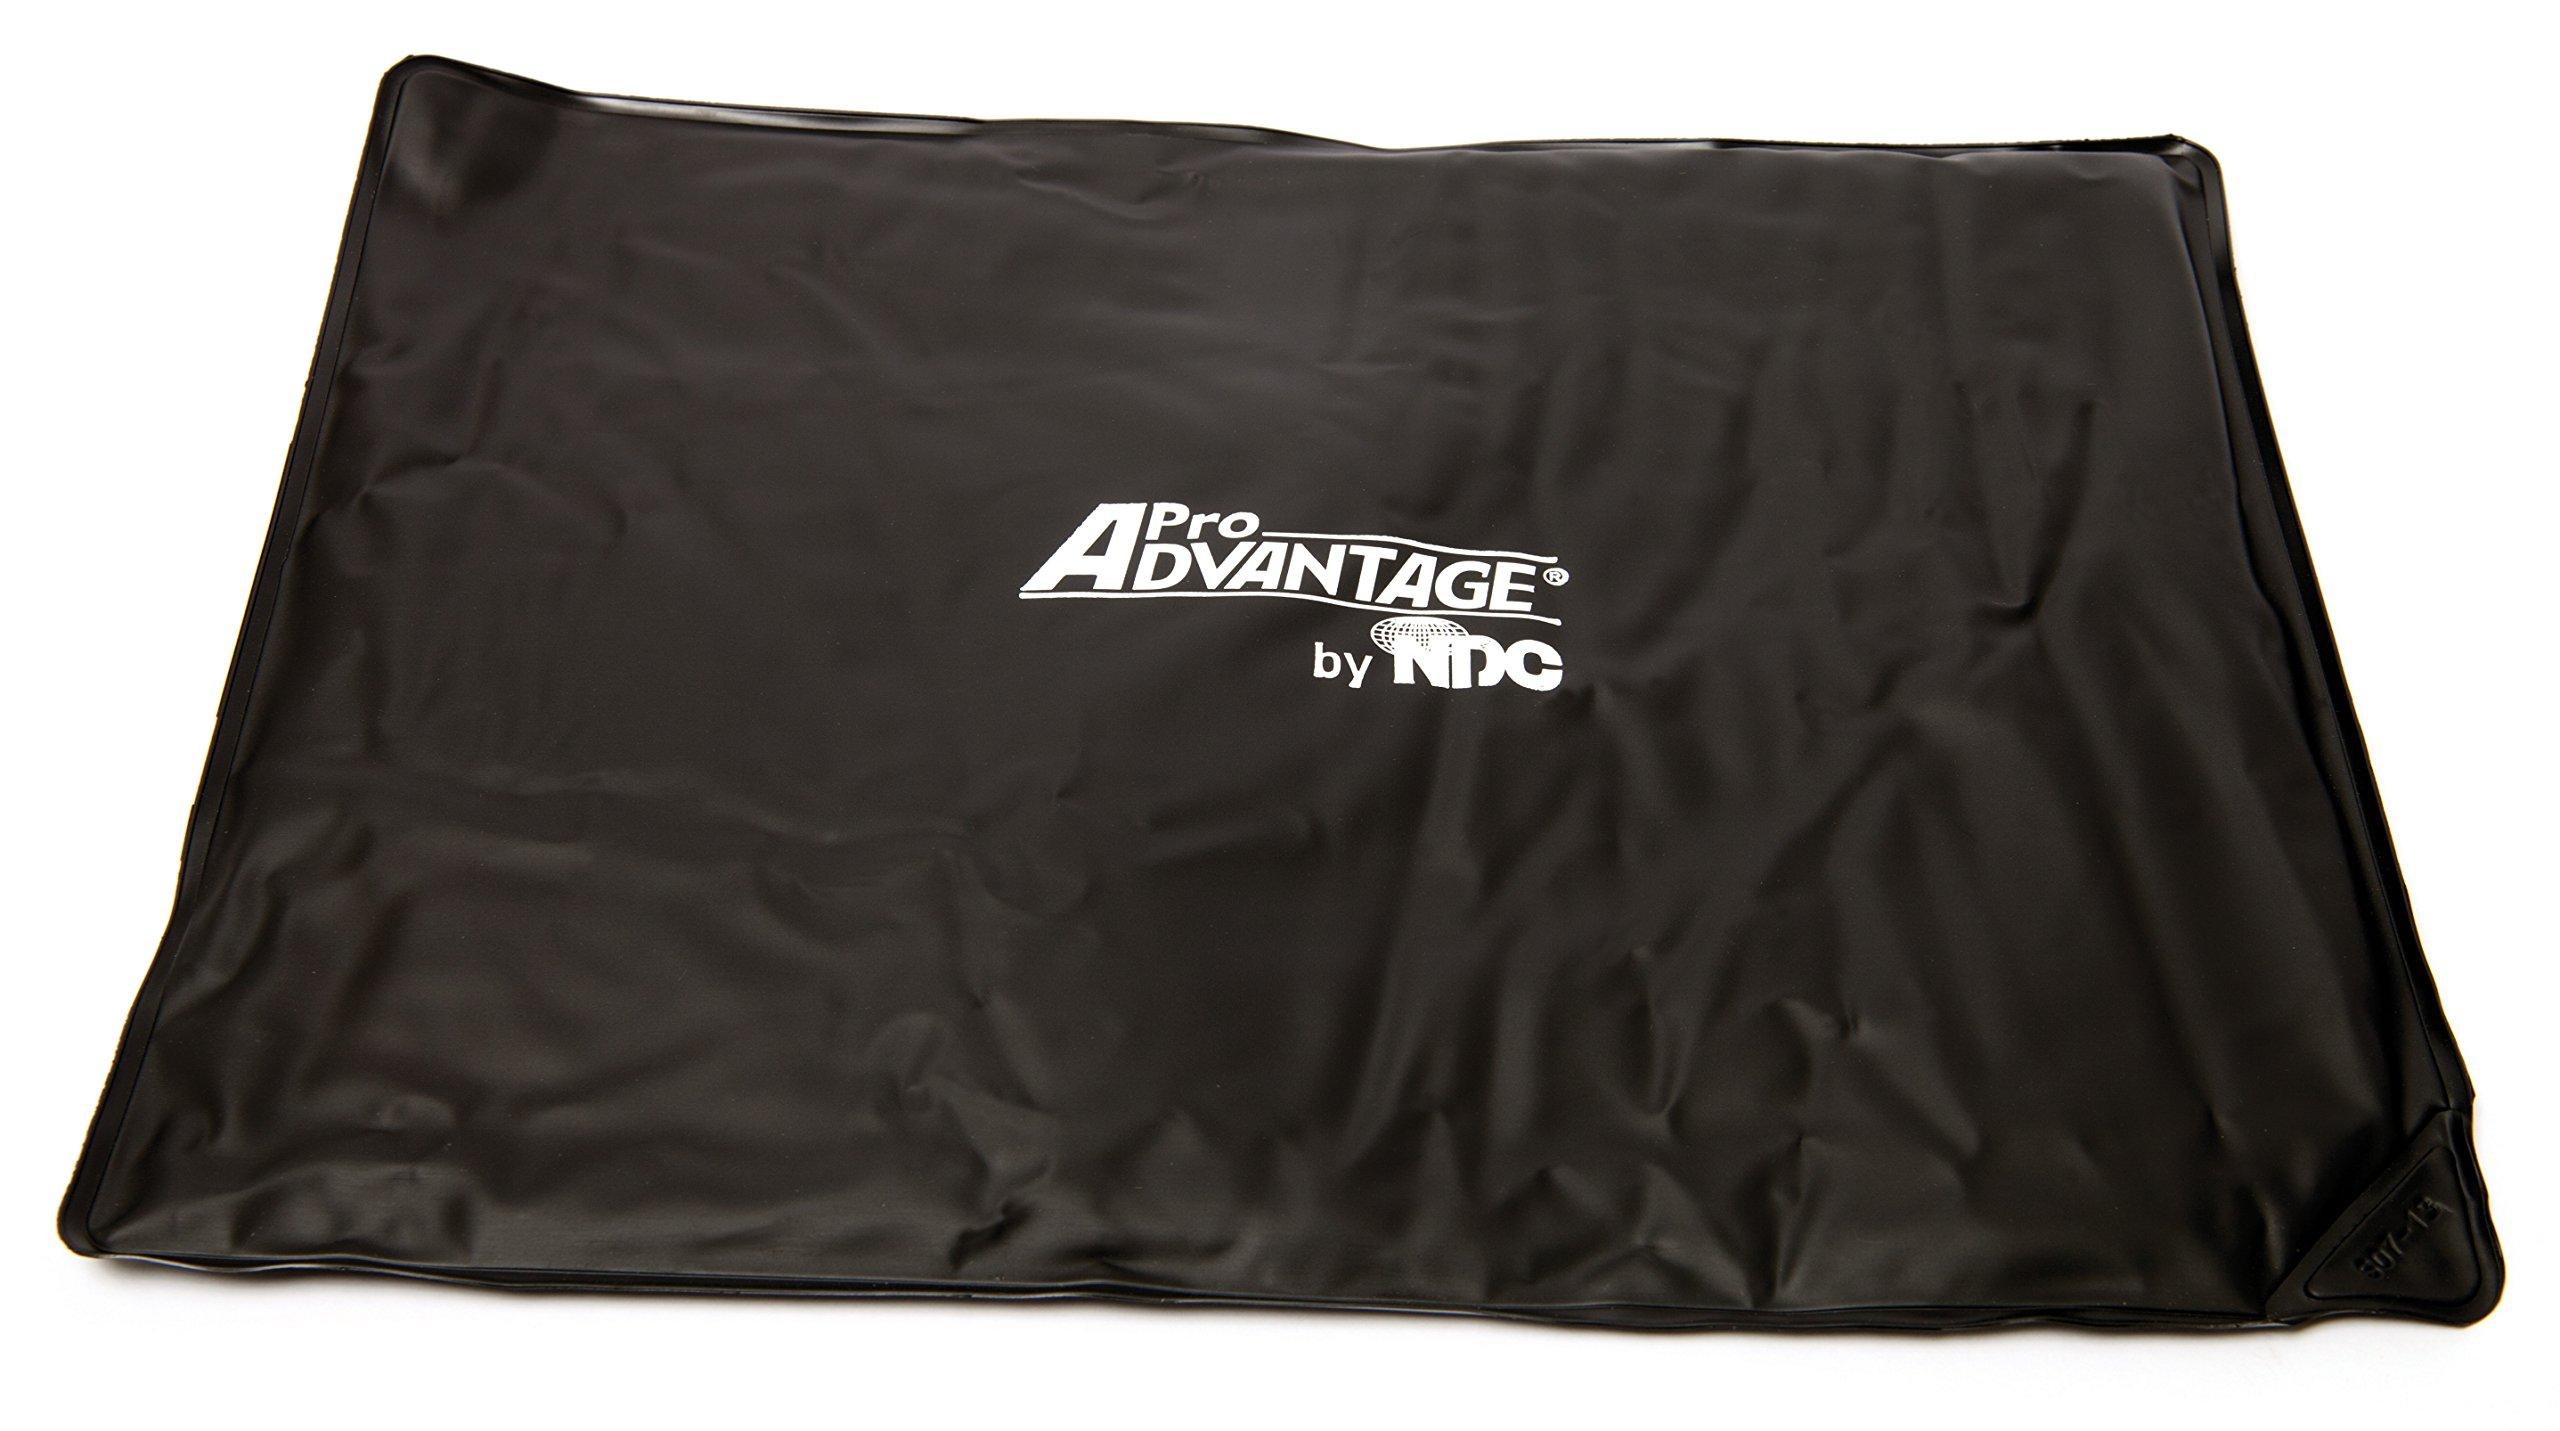 Pro Advantage PA-P504019 Cold Pack, Urethane, Oversized, 13'' x 19'', Black (021417)